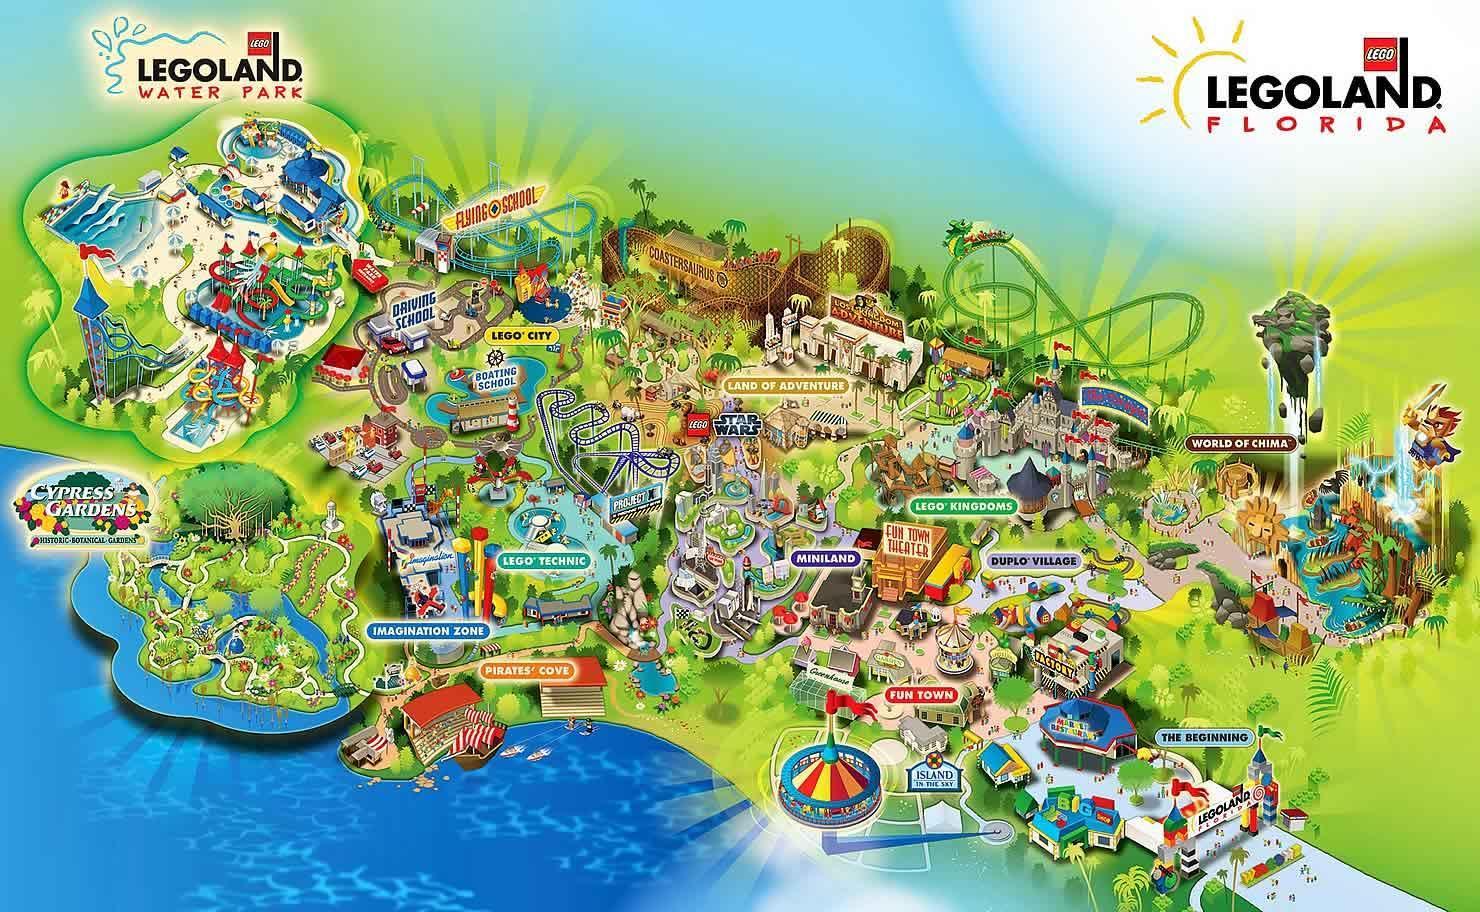 legoland dänemark karte Legoland Dänemark Landkarte   Dänemark legoland Karte (Europa Nord